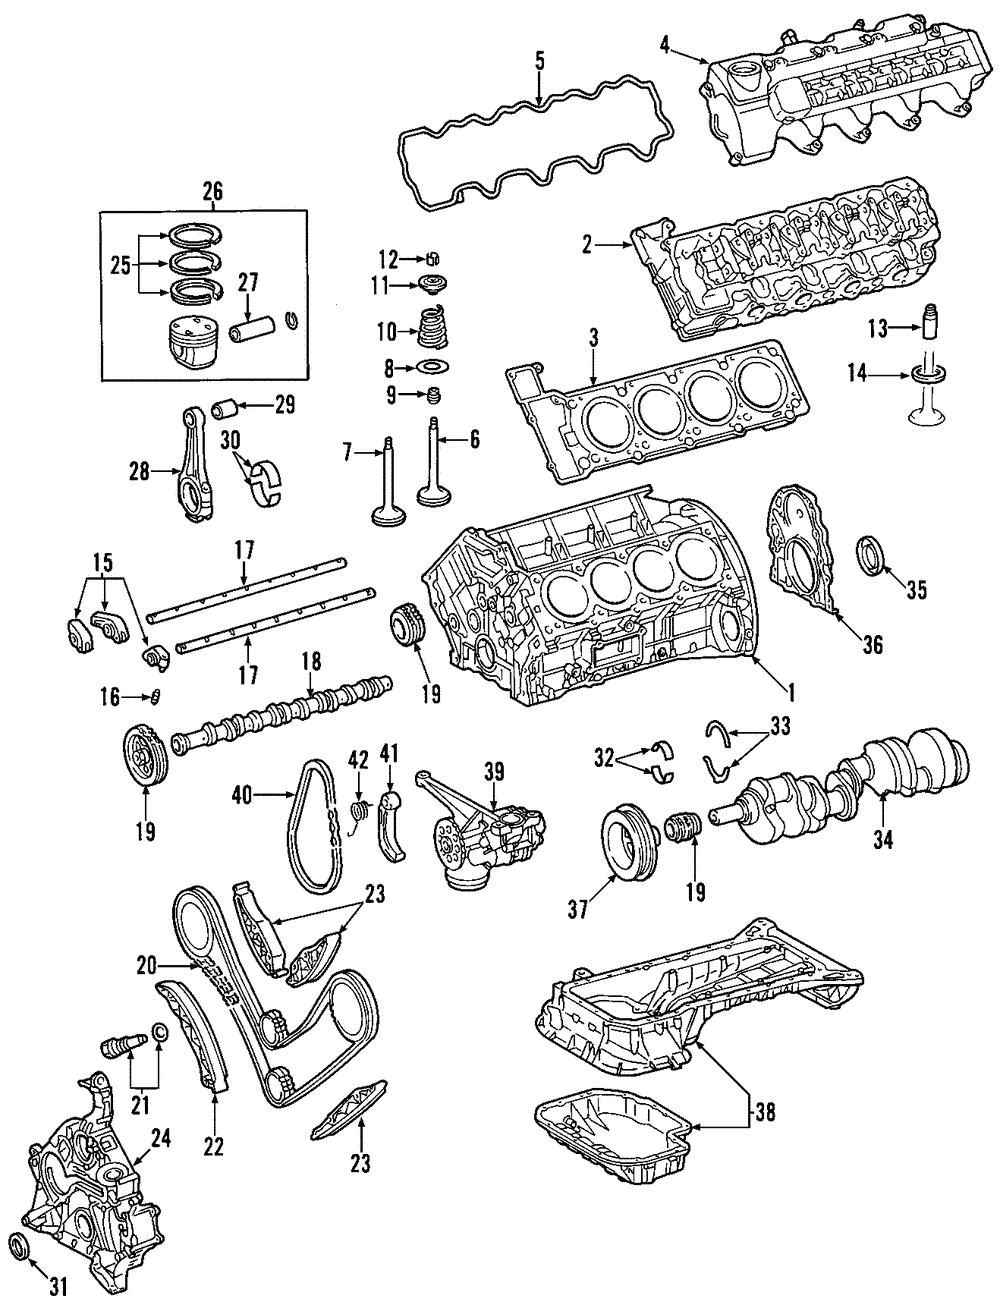 genuine mercedes benz tensioner arm 112 181 00 59 ebay CLK AMG Wheels main image